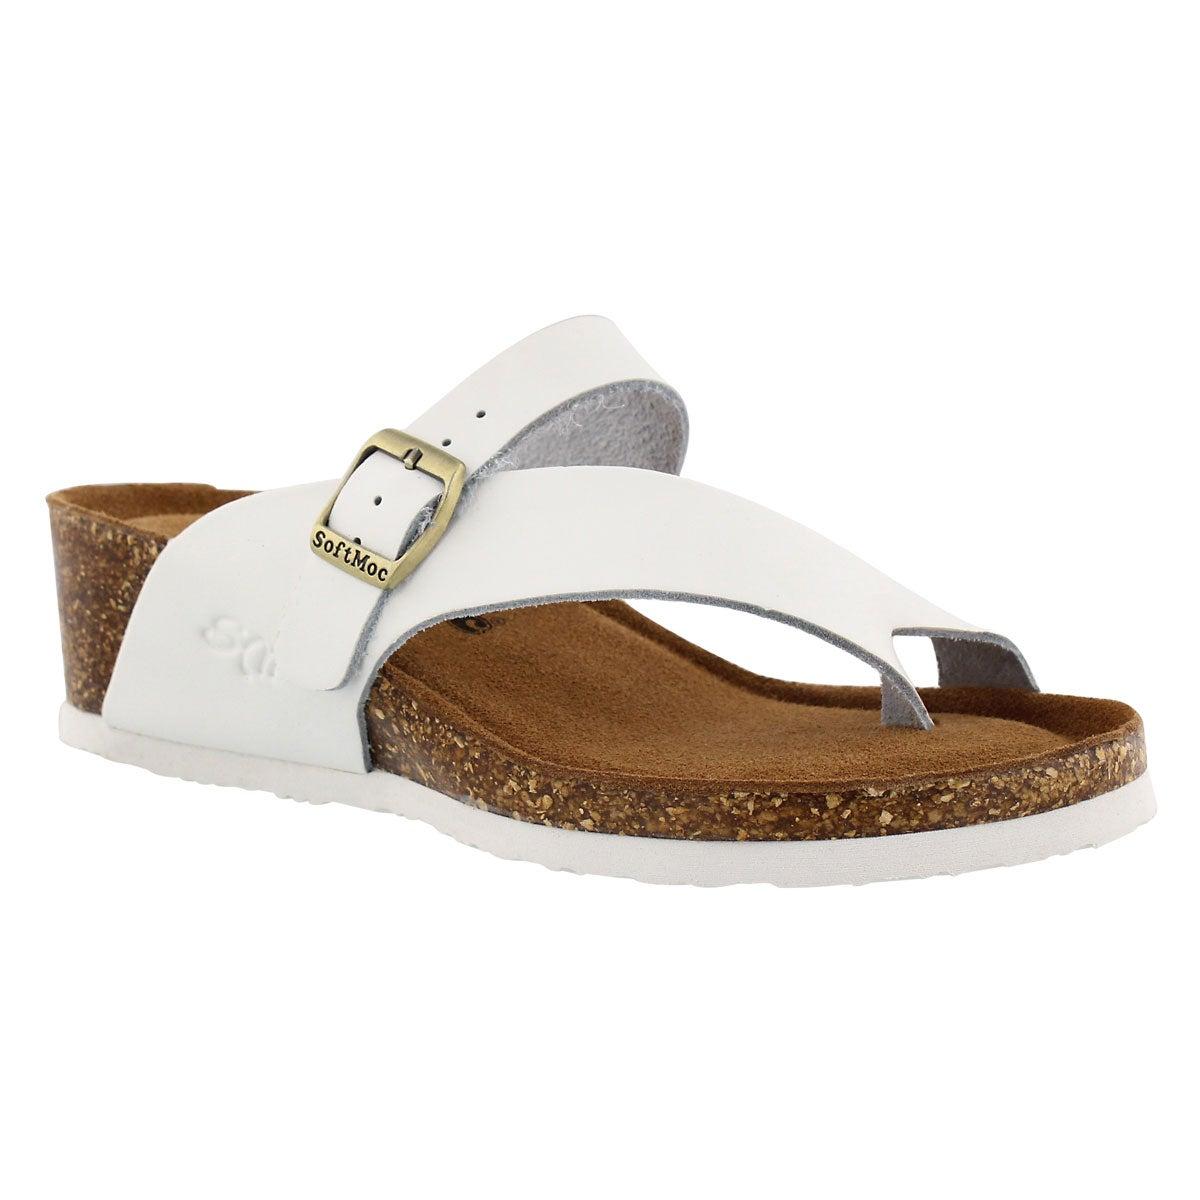 Women's AMBER 5 white memory foam wedge sandals